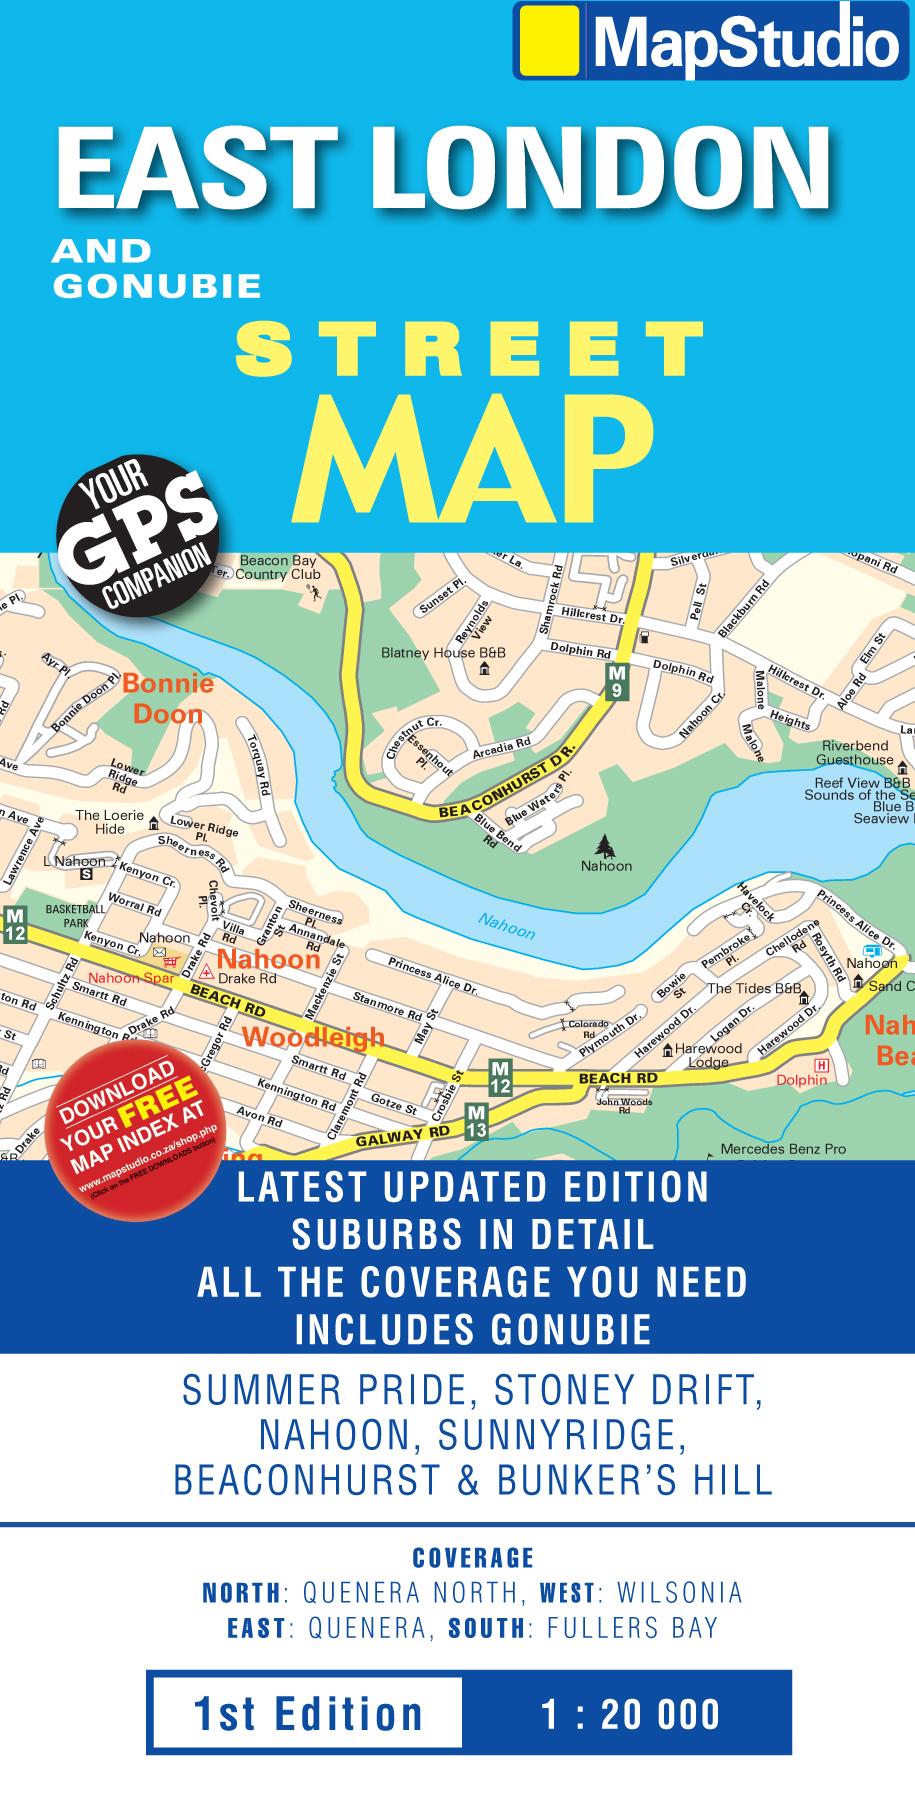 East London Gonubie Street Map MapStudio